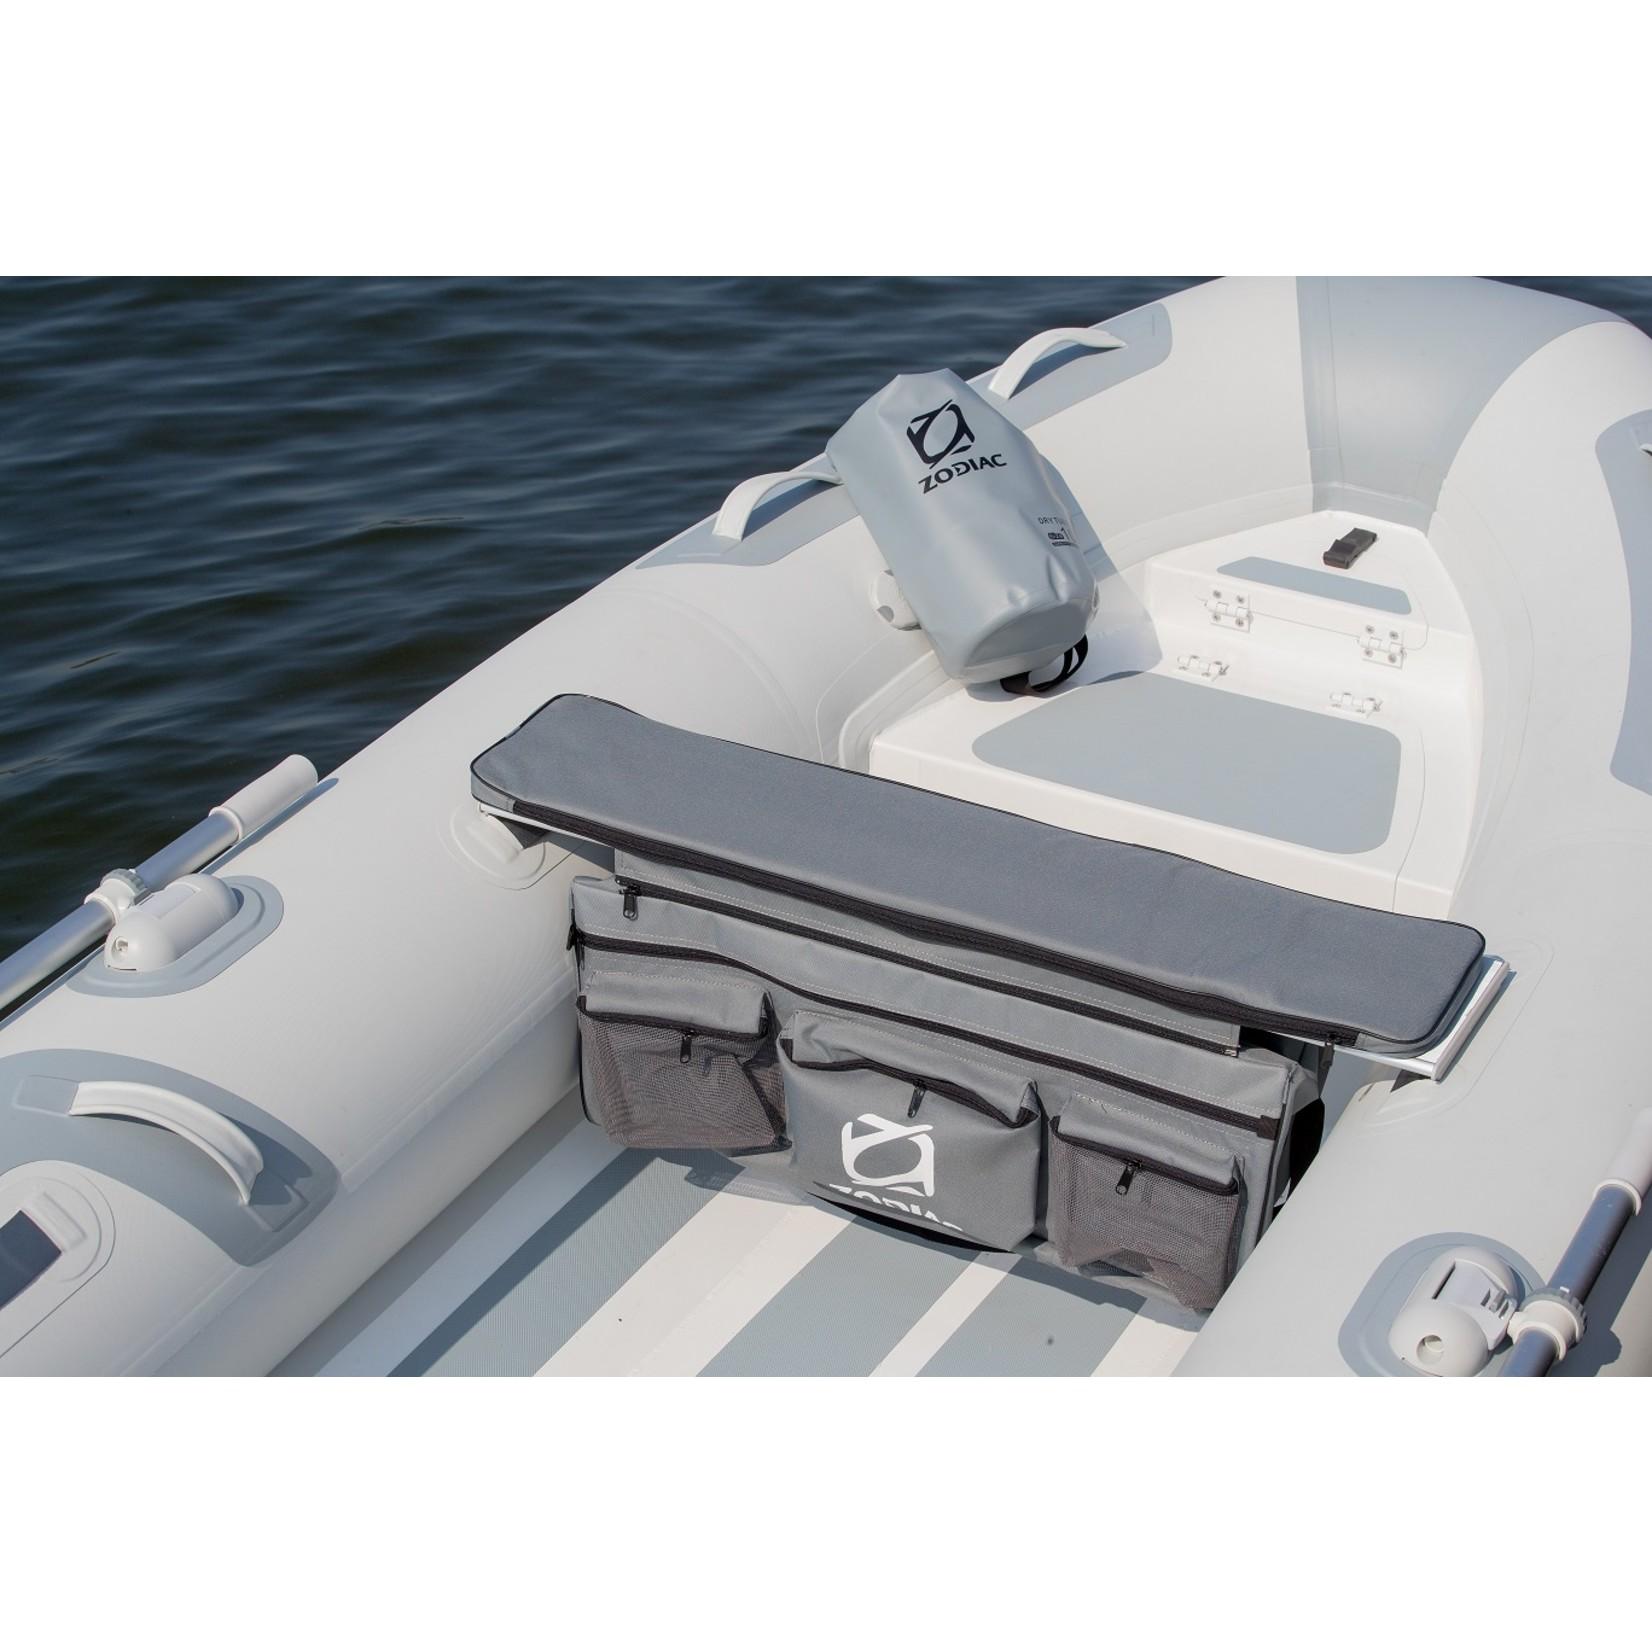 Zodiac Cadet 330 DL ALU RIB - Deck & Locker (3.33 mtr.)